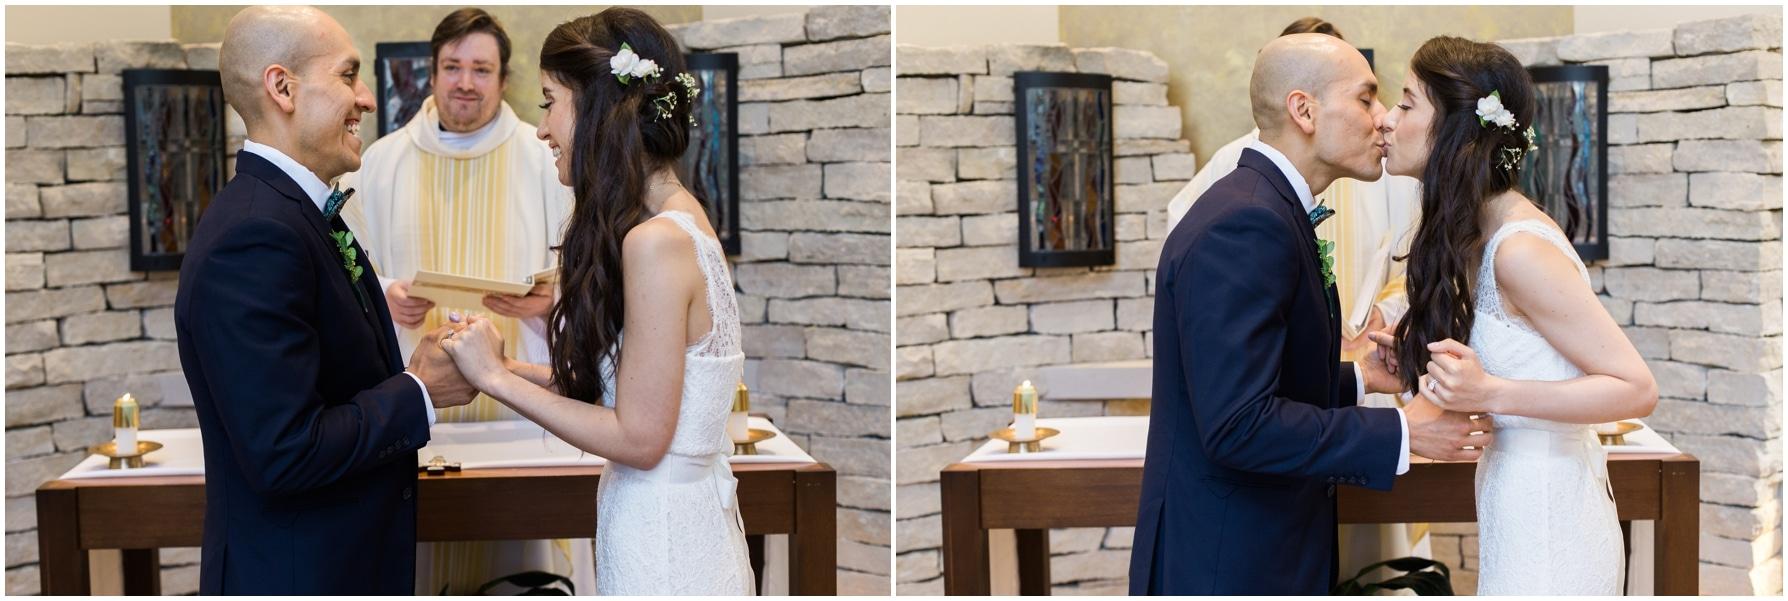 adam lowe photography, columbus , ohio, wedding, style, love , bride and groom, stylish, wedding dress, wedding suit,